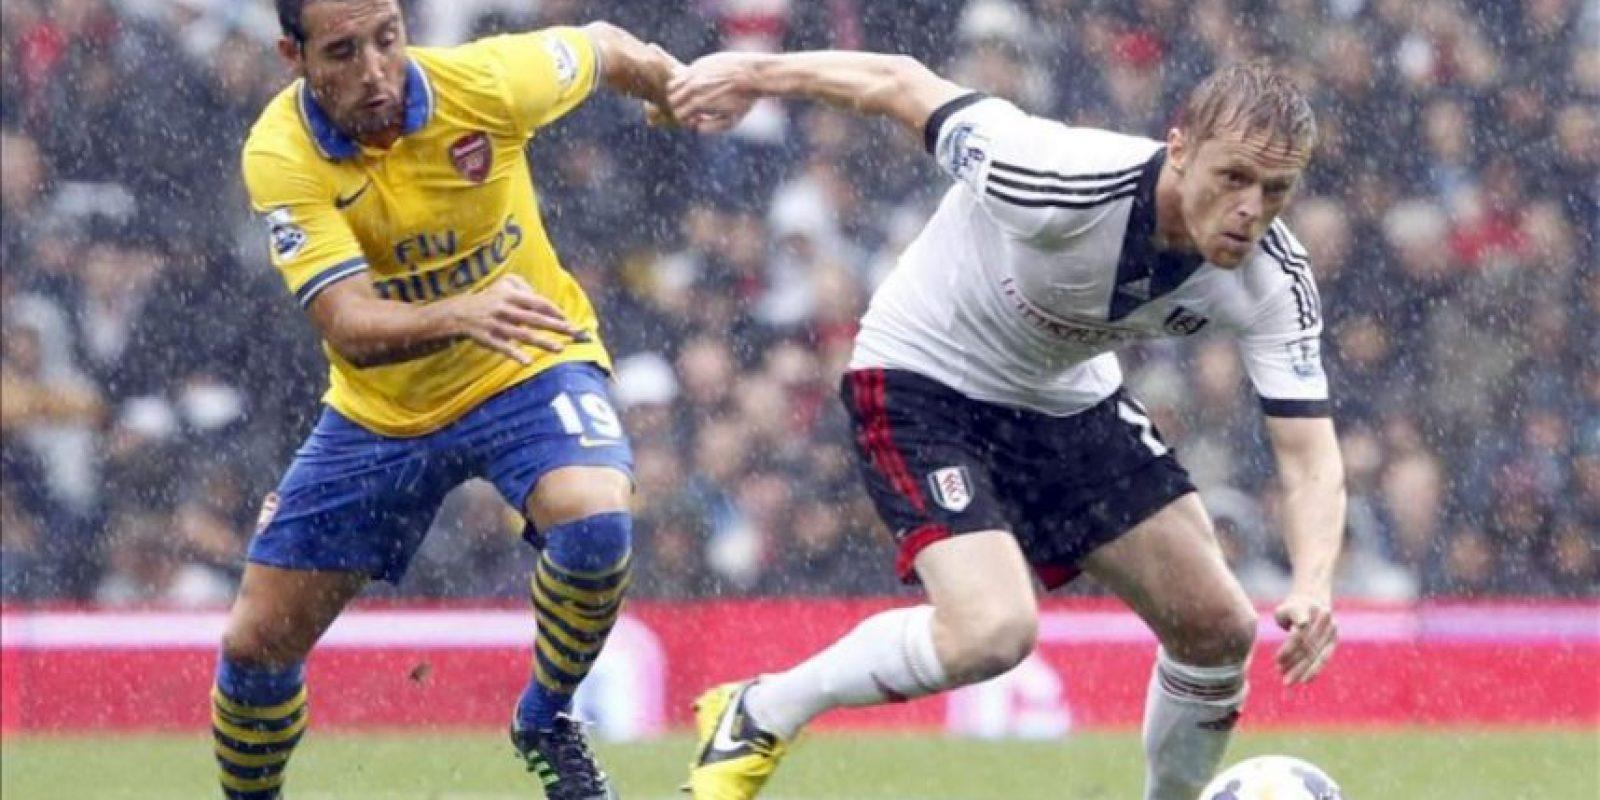 El jugador español del Arsenal Santi Cazorla persigue al irlandés Damien Duff, del Fulham, durante el partido de l Premier League en Craven Cottage, Londres. EFE